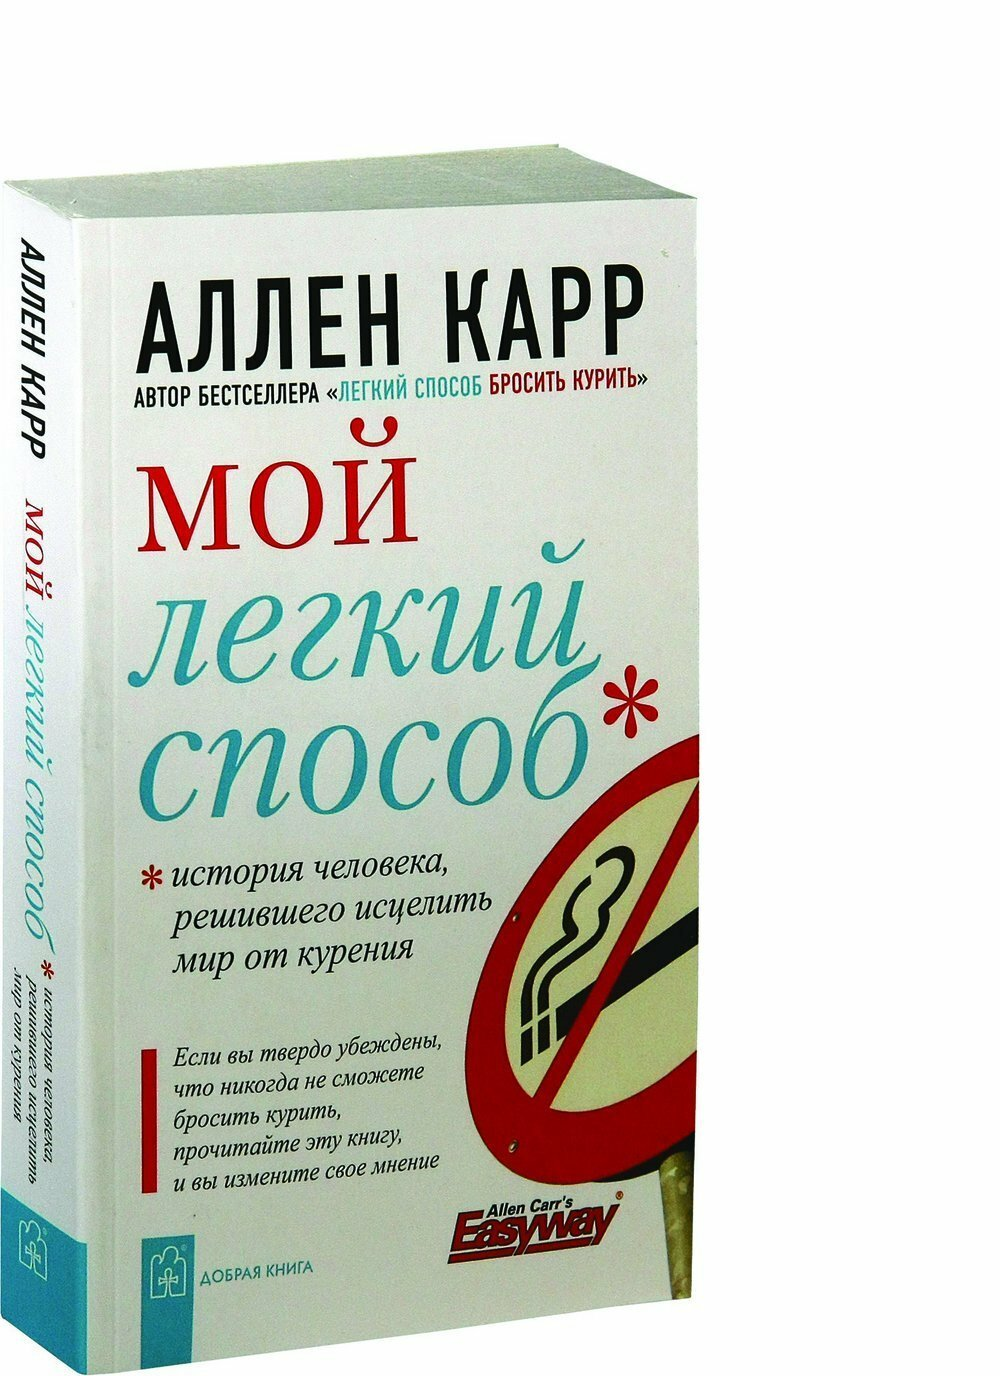 Таблетки от курения Аллена Карра в Ужгороде